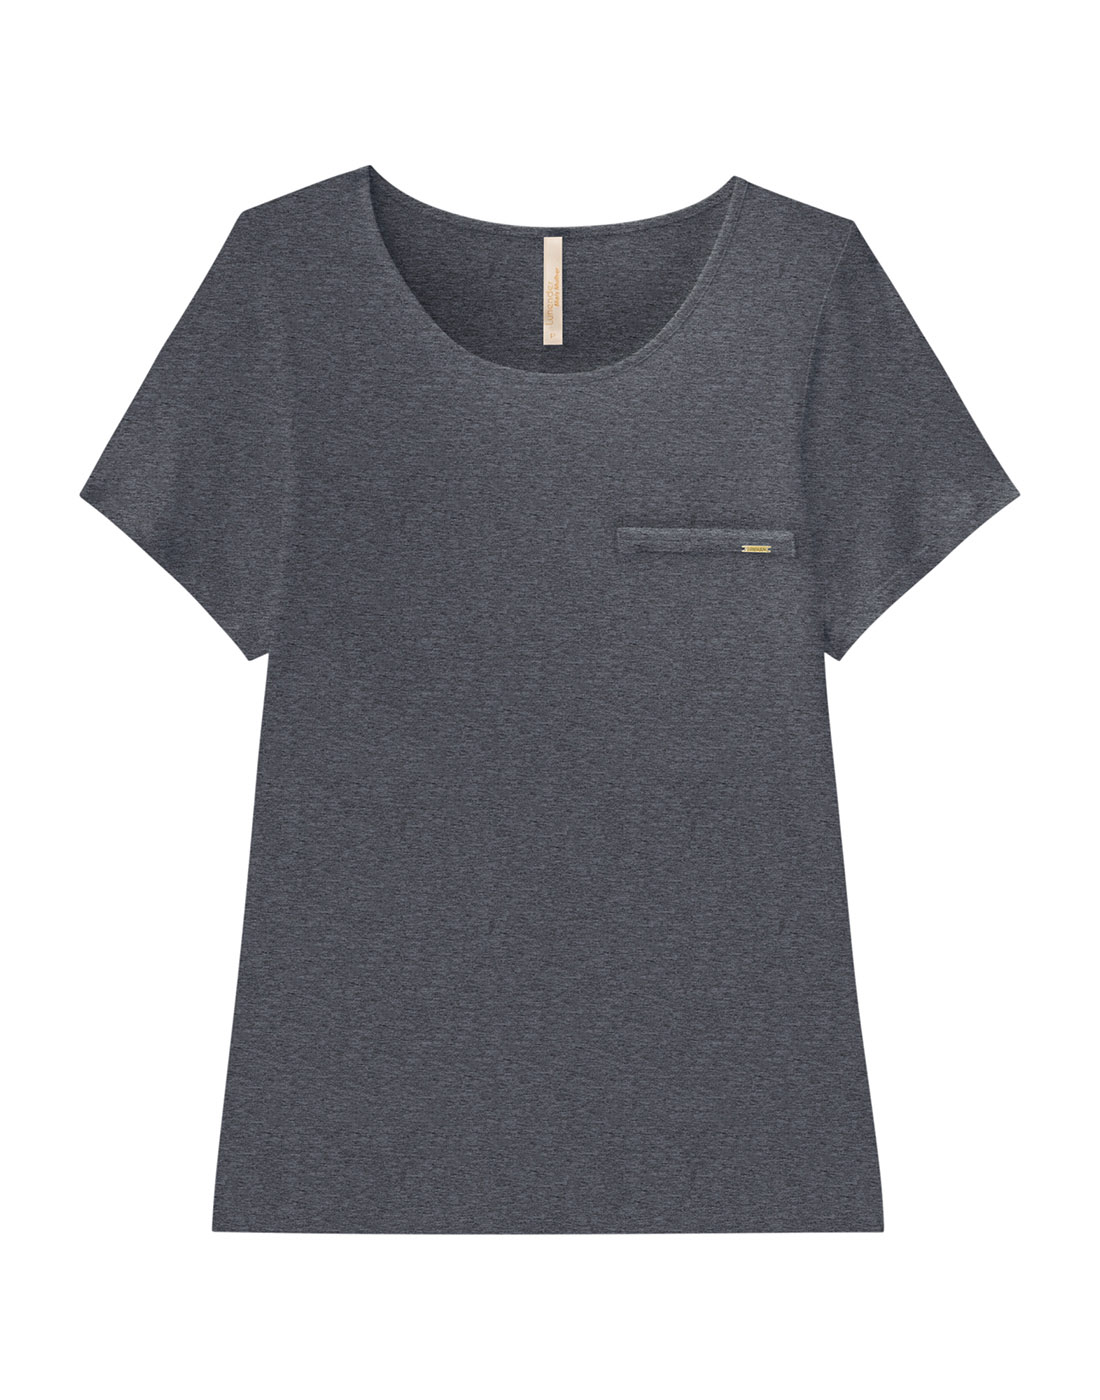 Blusa Básica Plus Size Malha Viscose Lunender Mais Mulher